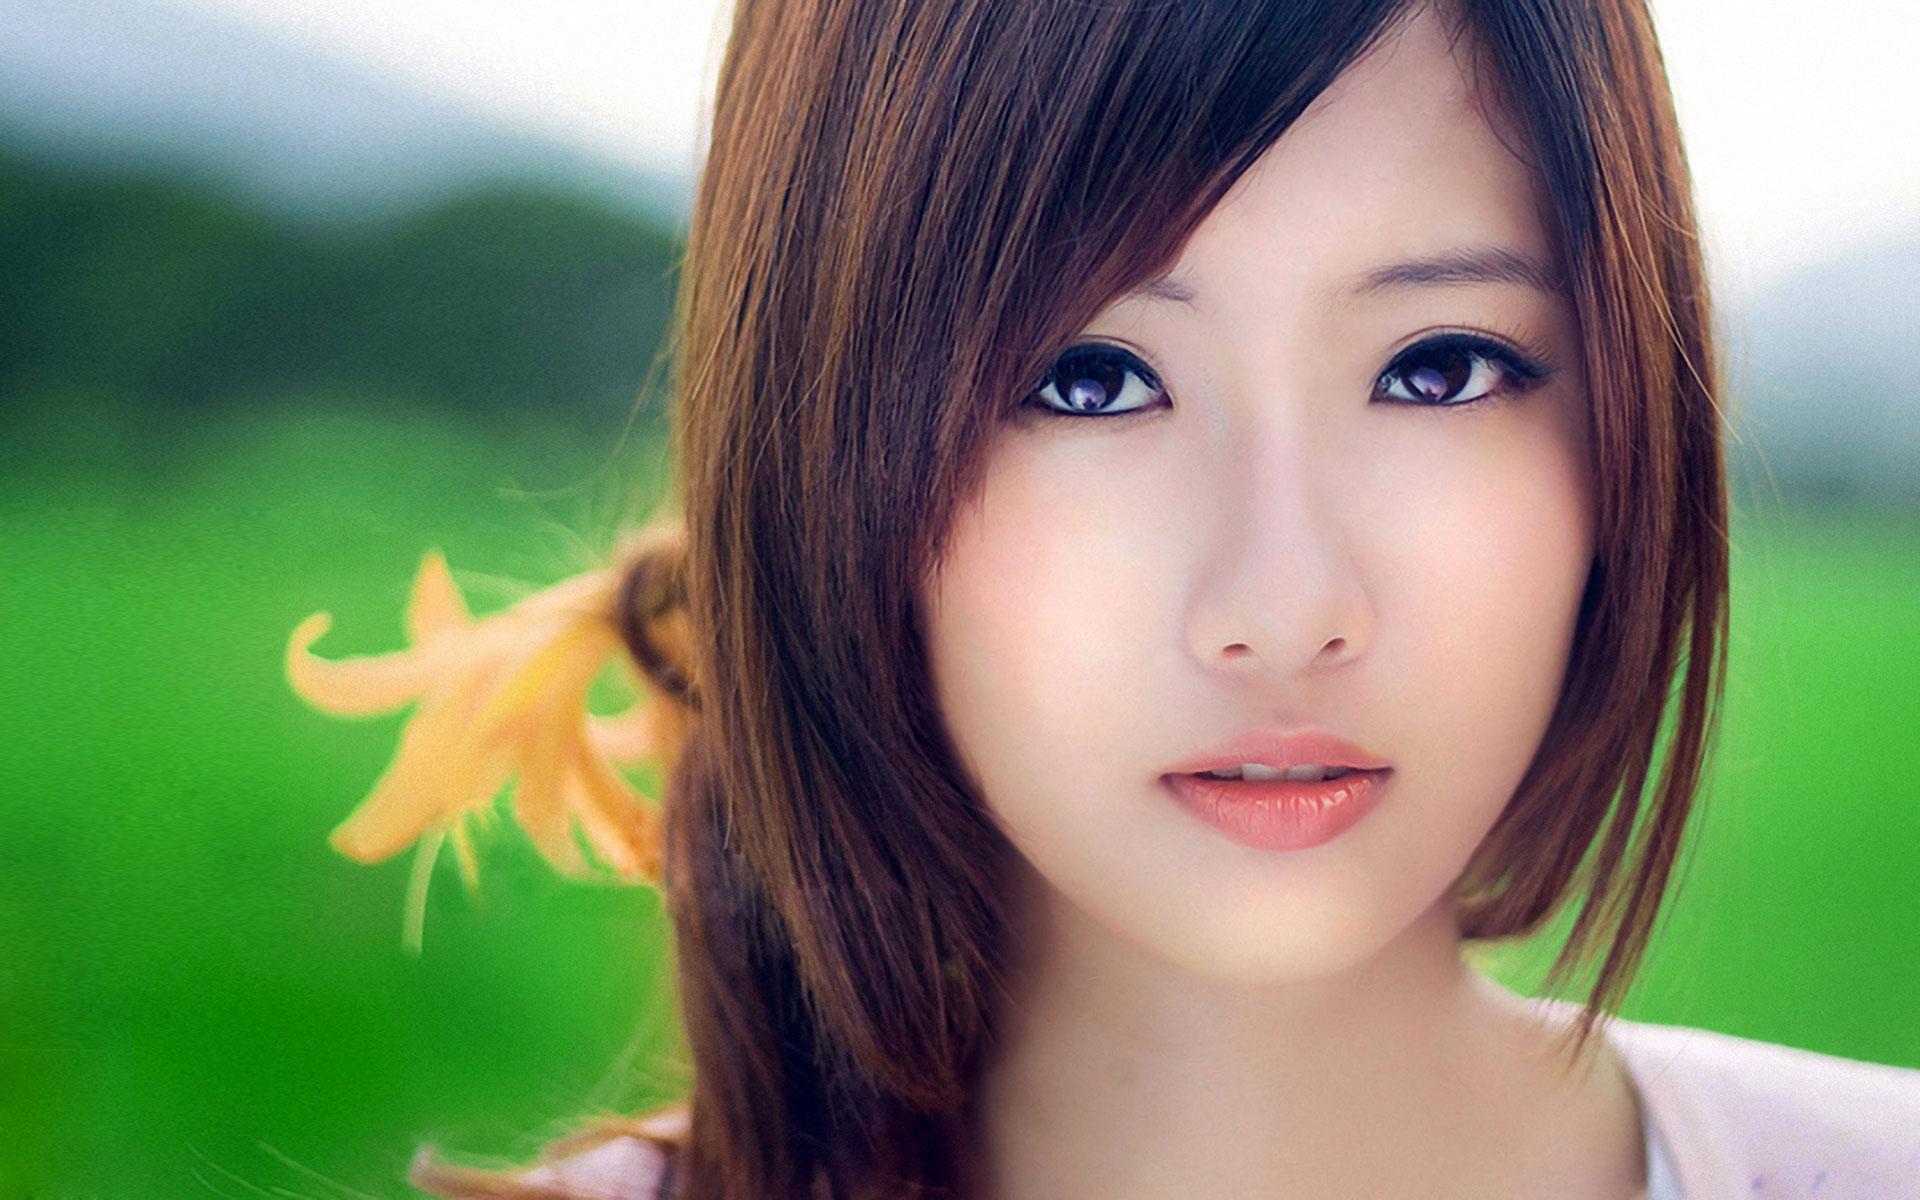 Hd wallpaper cute girl - Description Cute Girl Hd Wallpaper Is A Hi Res Wallpaper For Pc